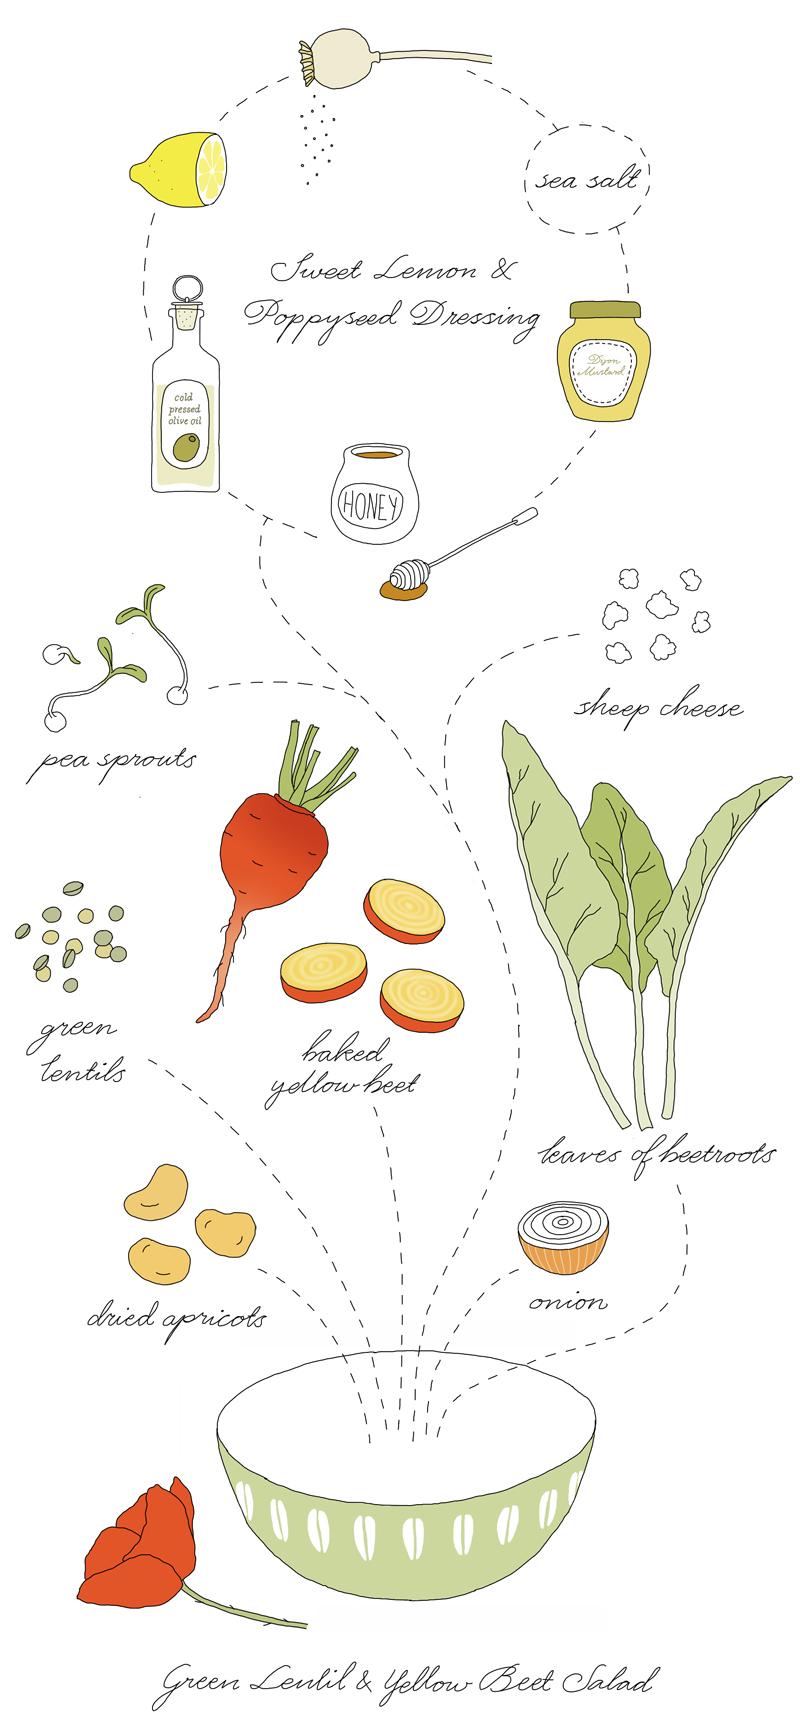 800x1733 Green Kitchen Stories Green Lentil Amp Yellow Beet Salad